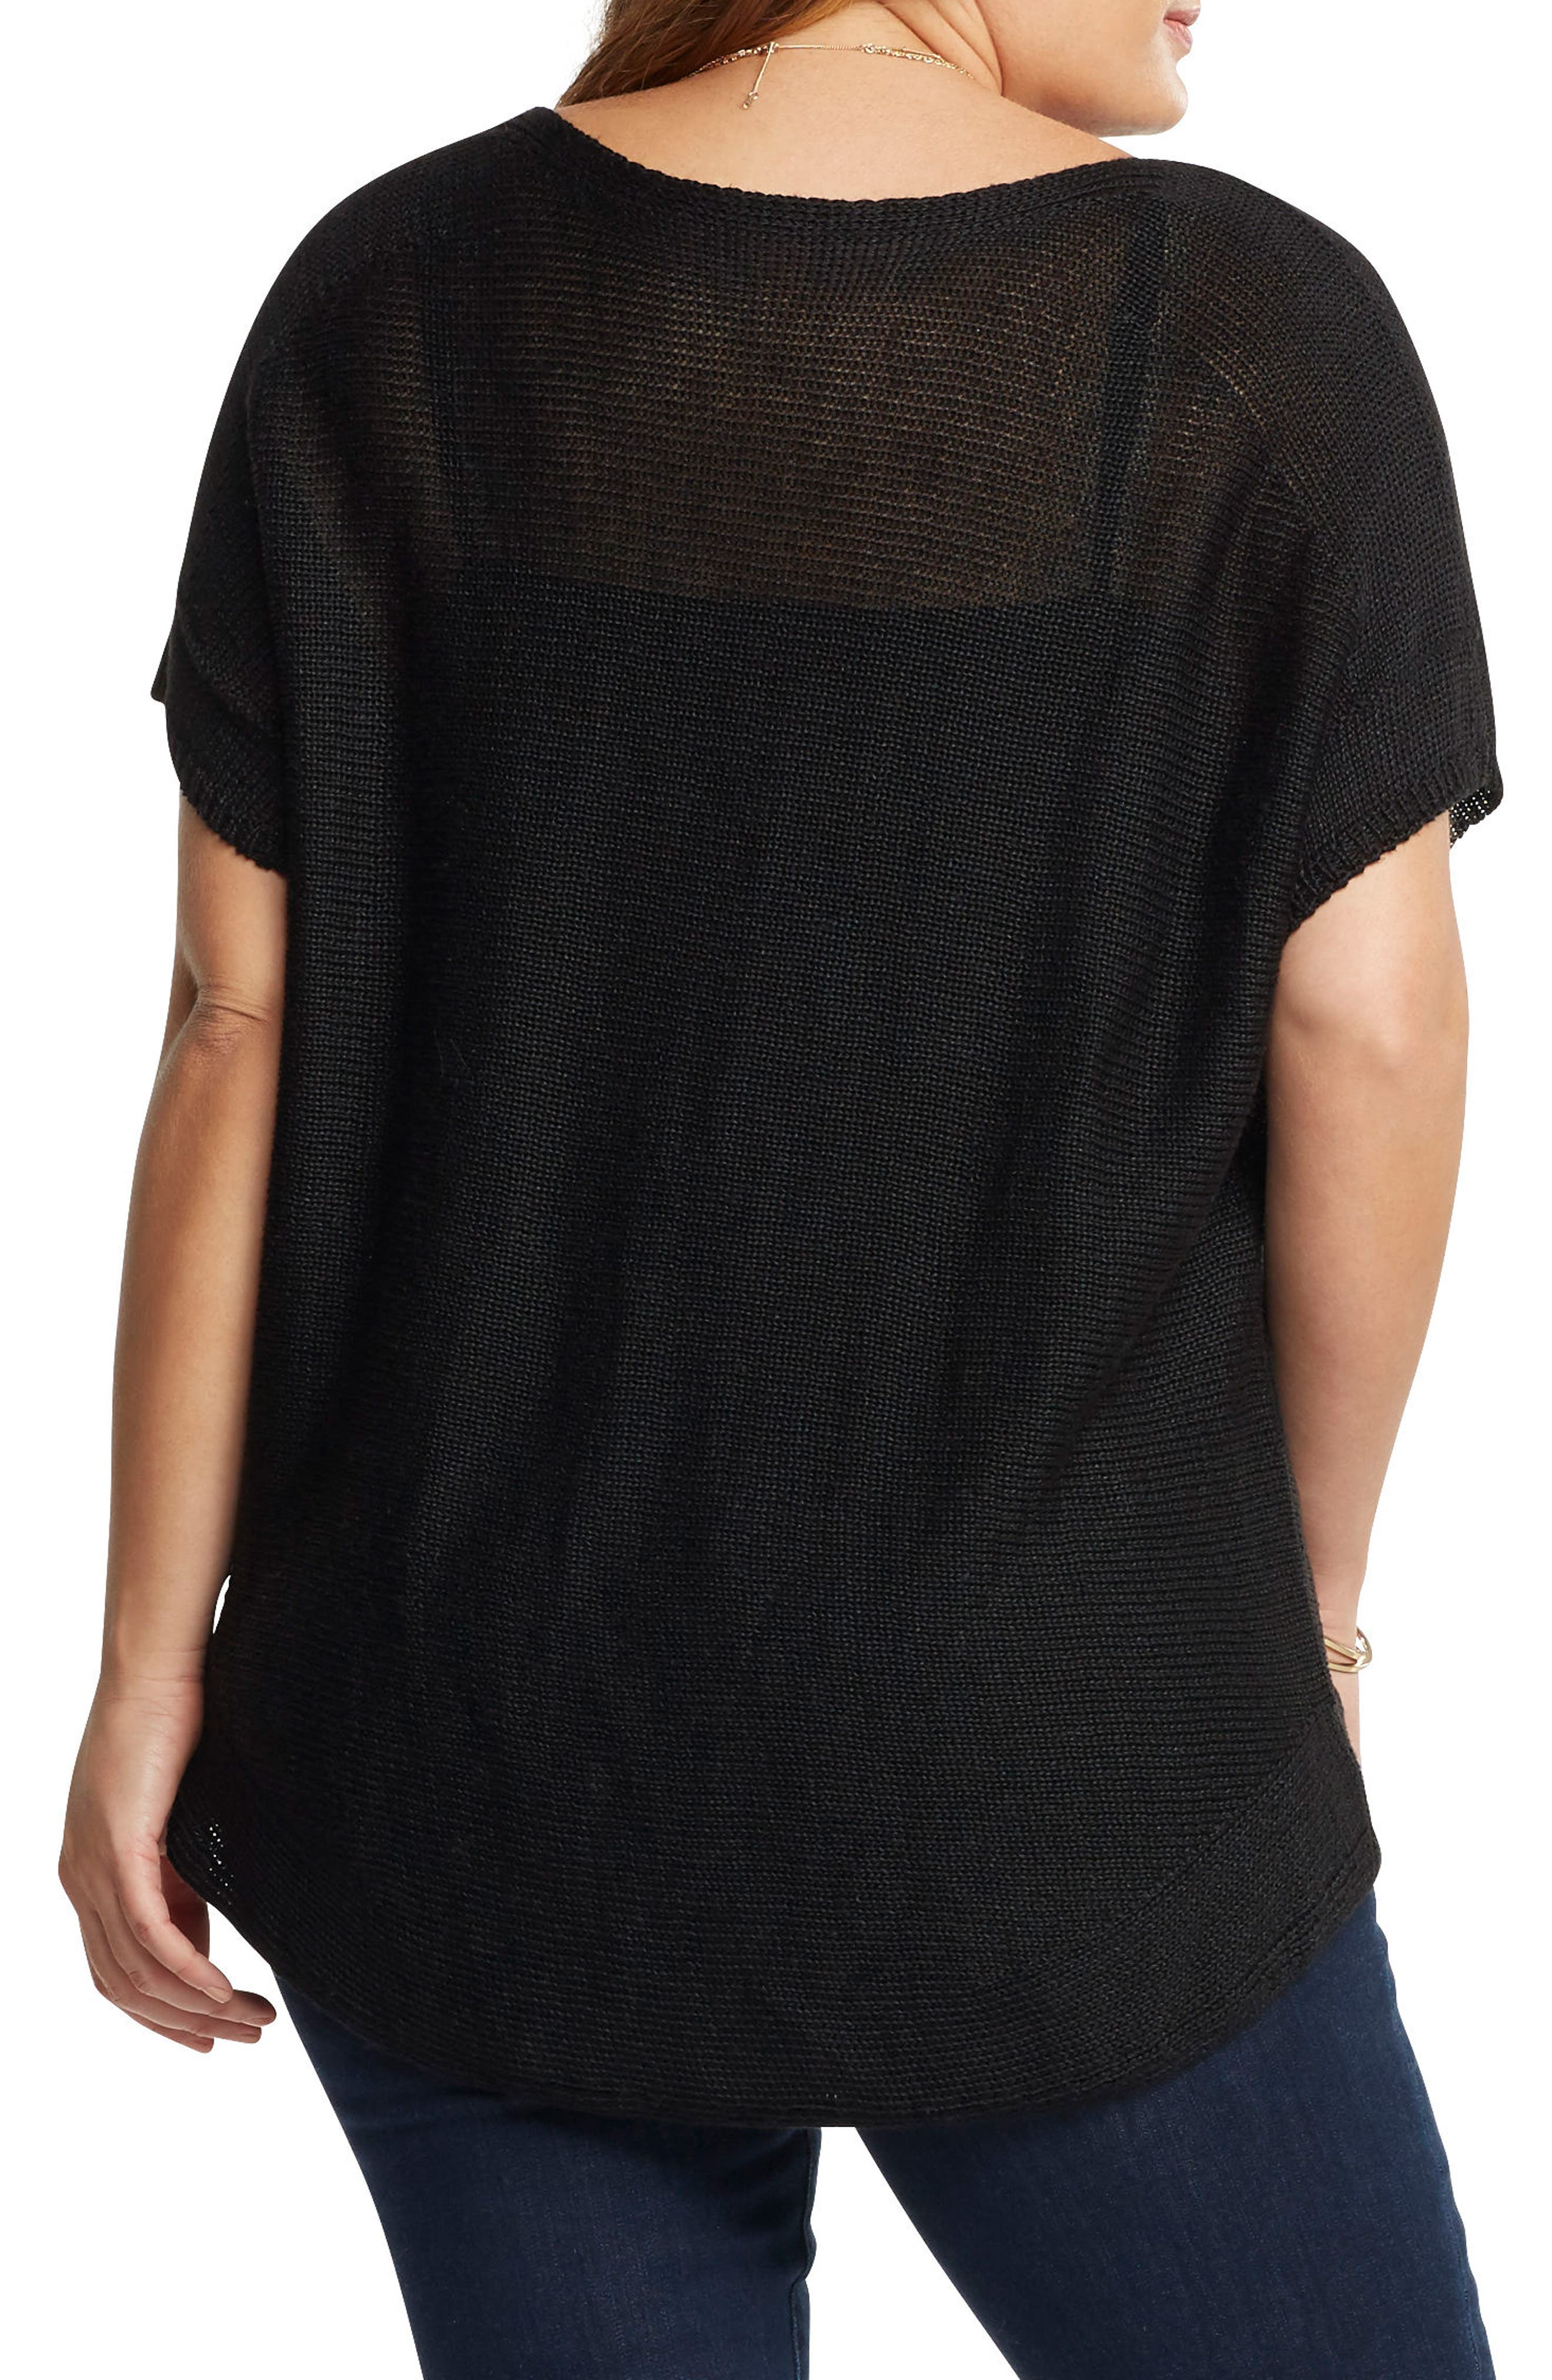 Padma Linen Blend Sweater,                             Alternate thumbnail 2, color,                             001